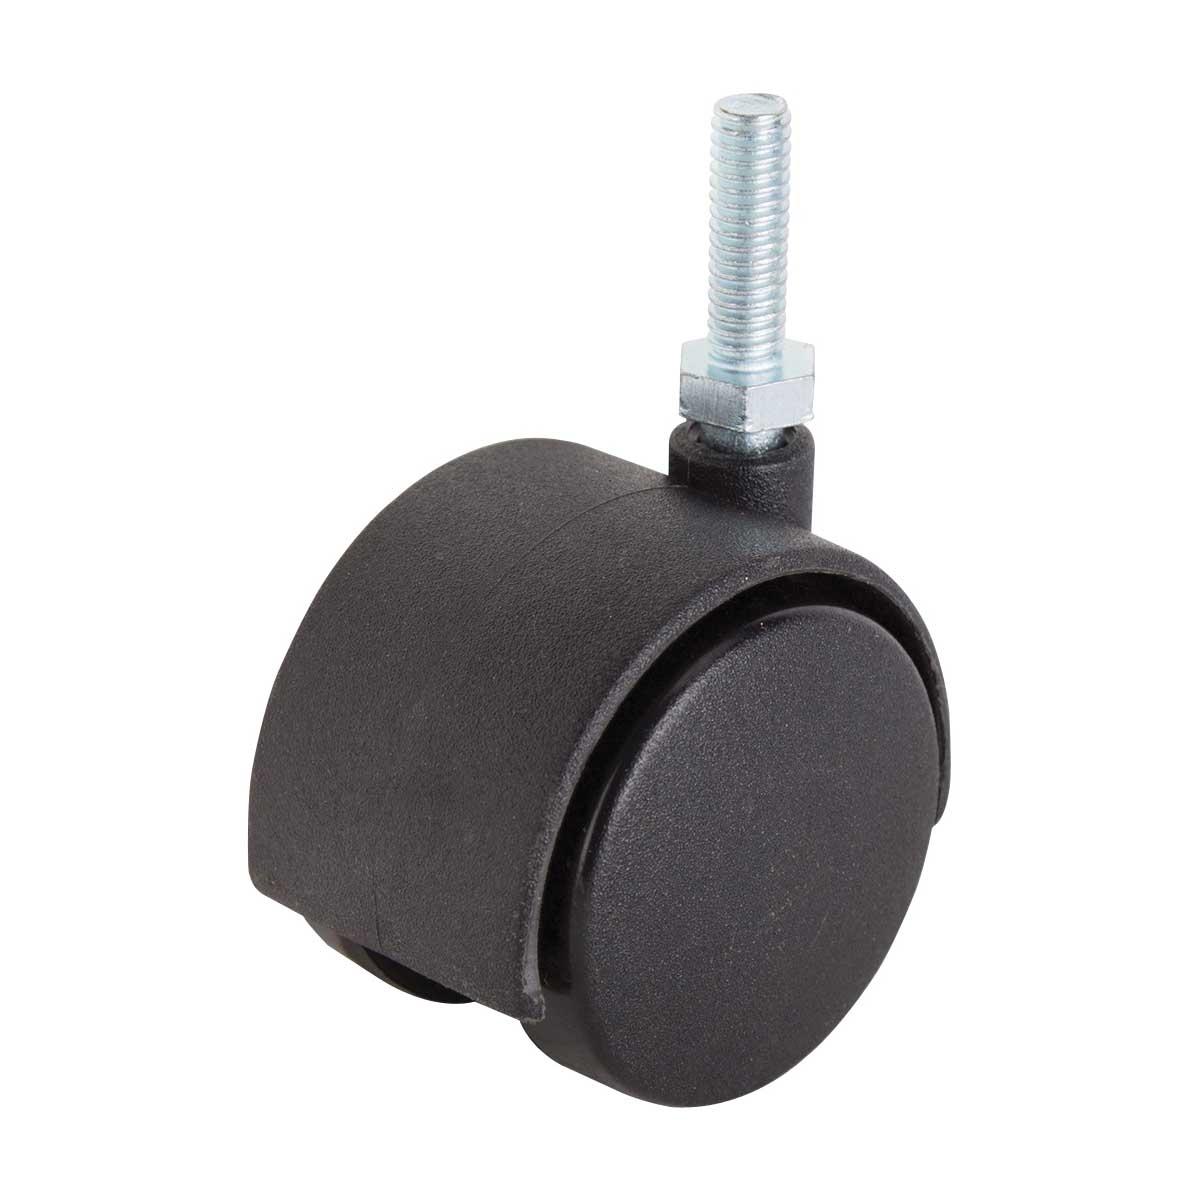 Picture of ProSource JC-F08-PS Caster, 2 in Dia Wheel, Nylon Wheel, Black, 75 lb